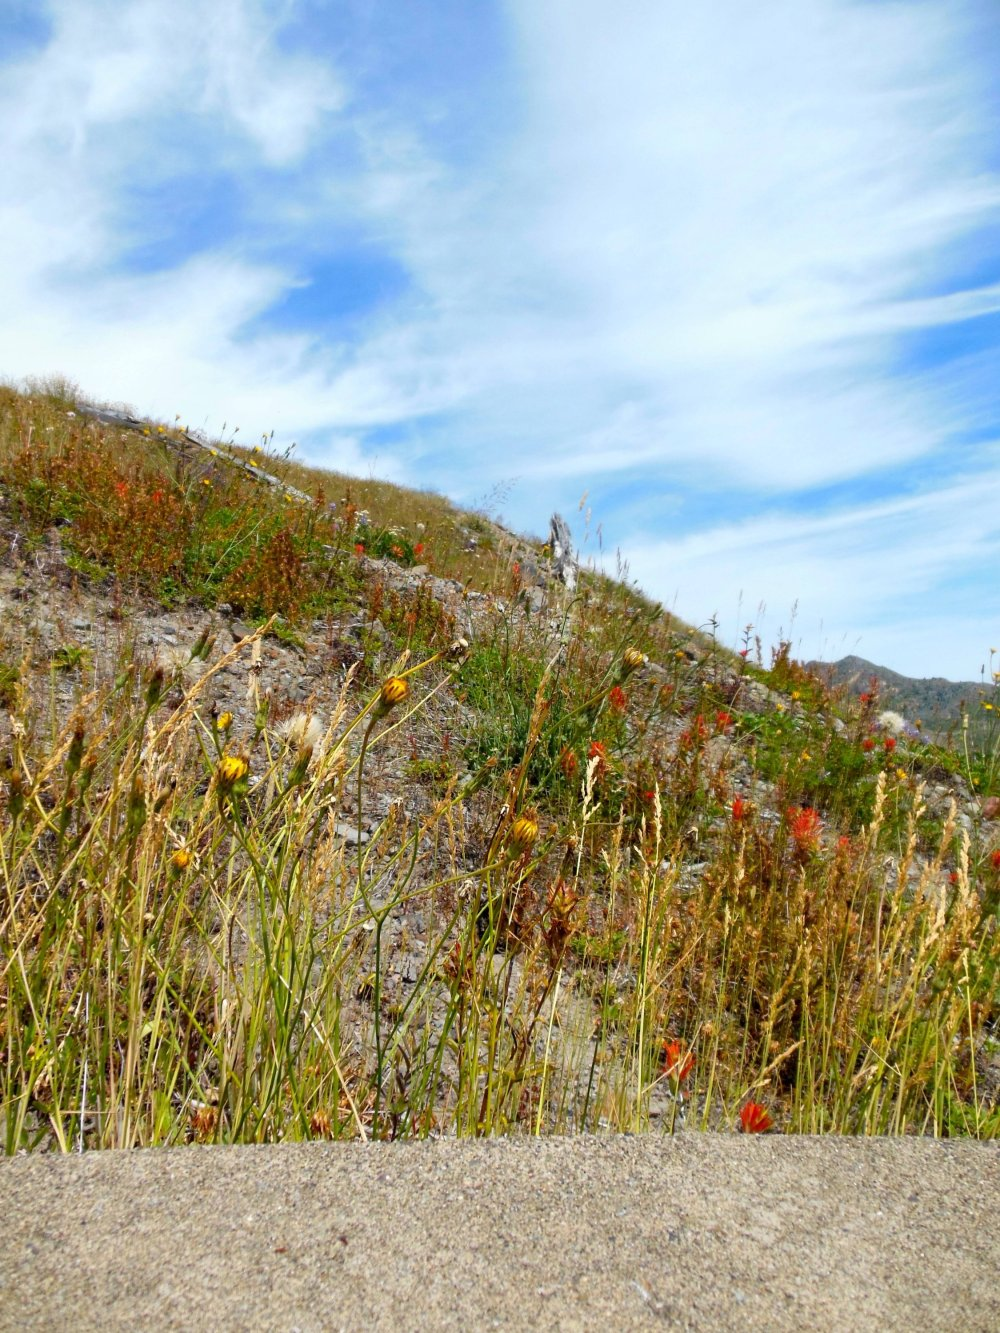 Mount St. Helens Wildflowers